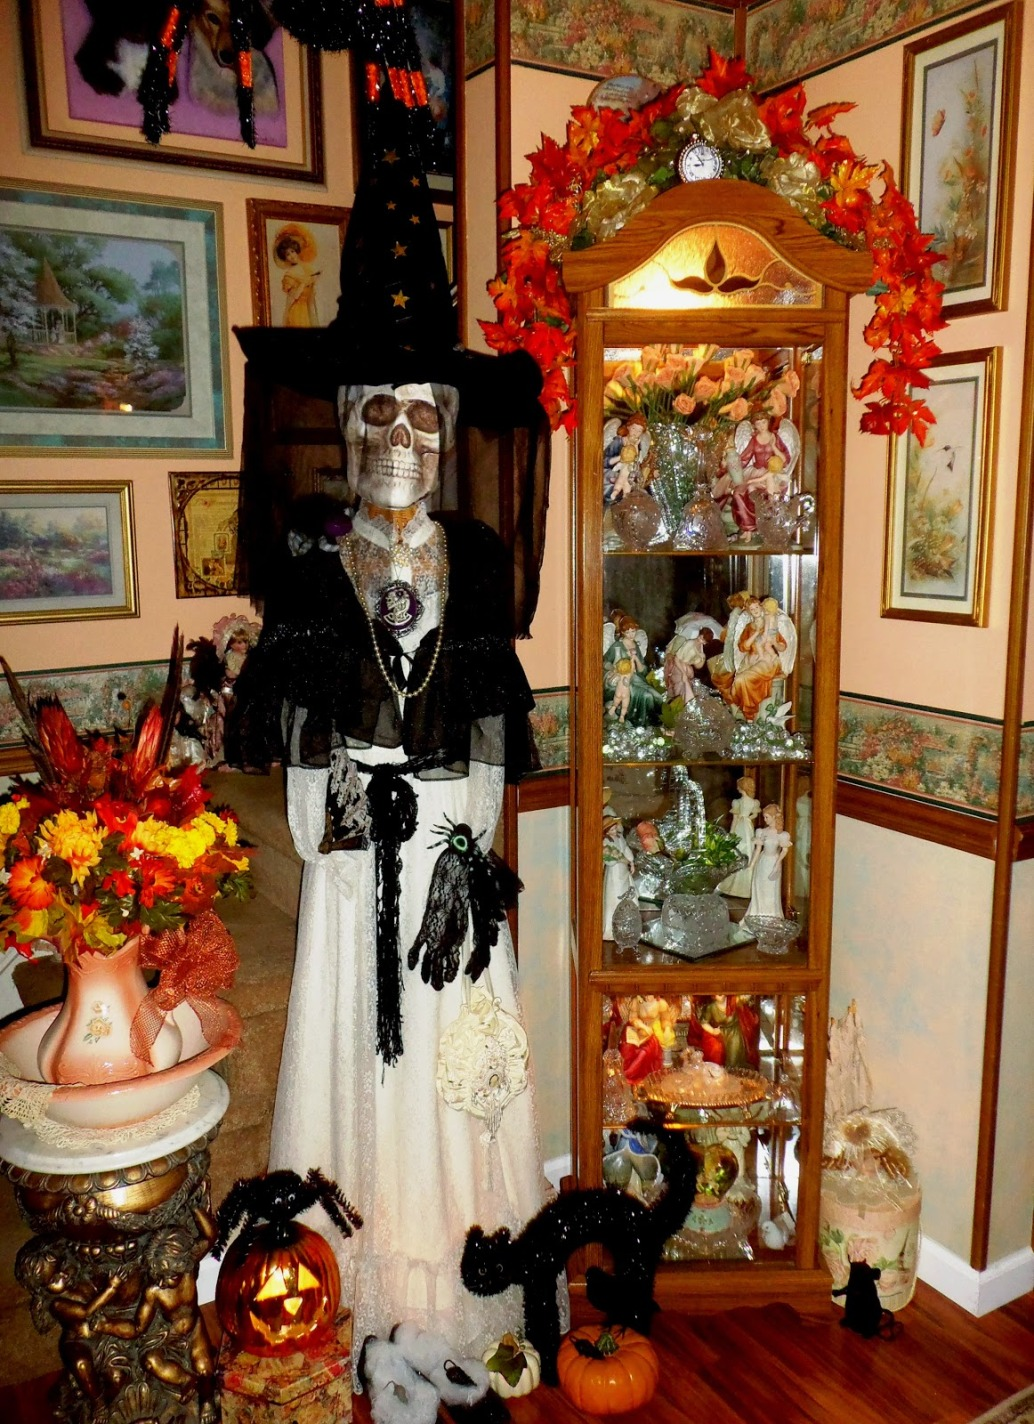 scary-halloween-skull-in-white-color-wear-black-hat-wooden-classy.jpg